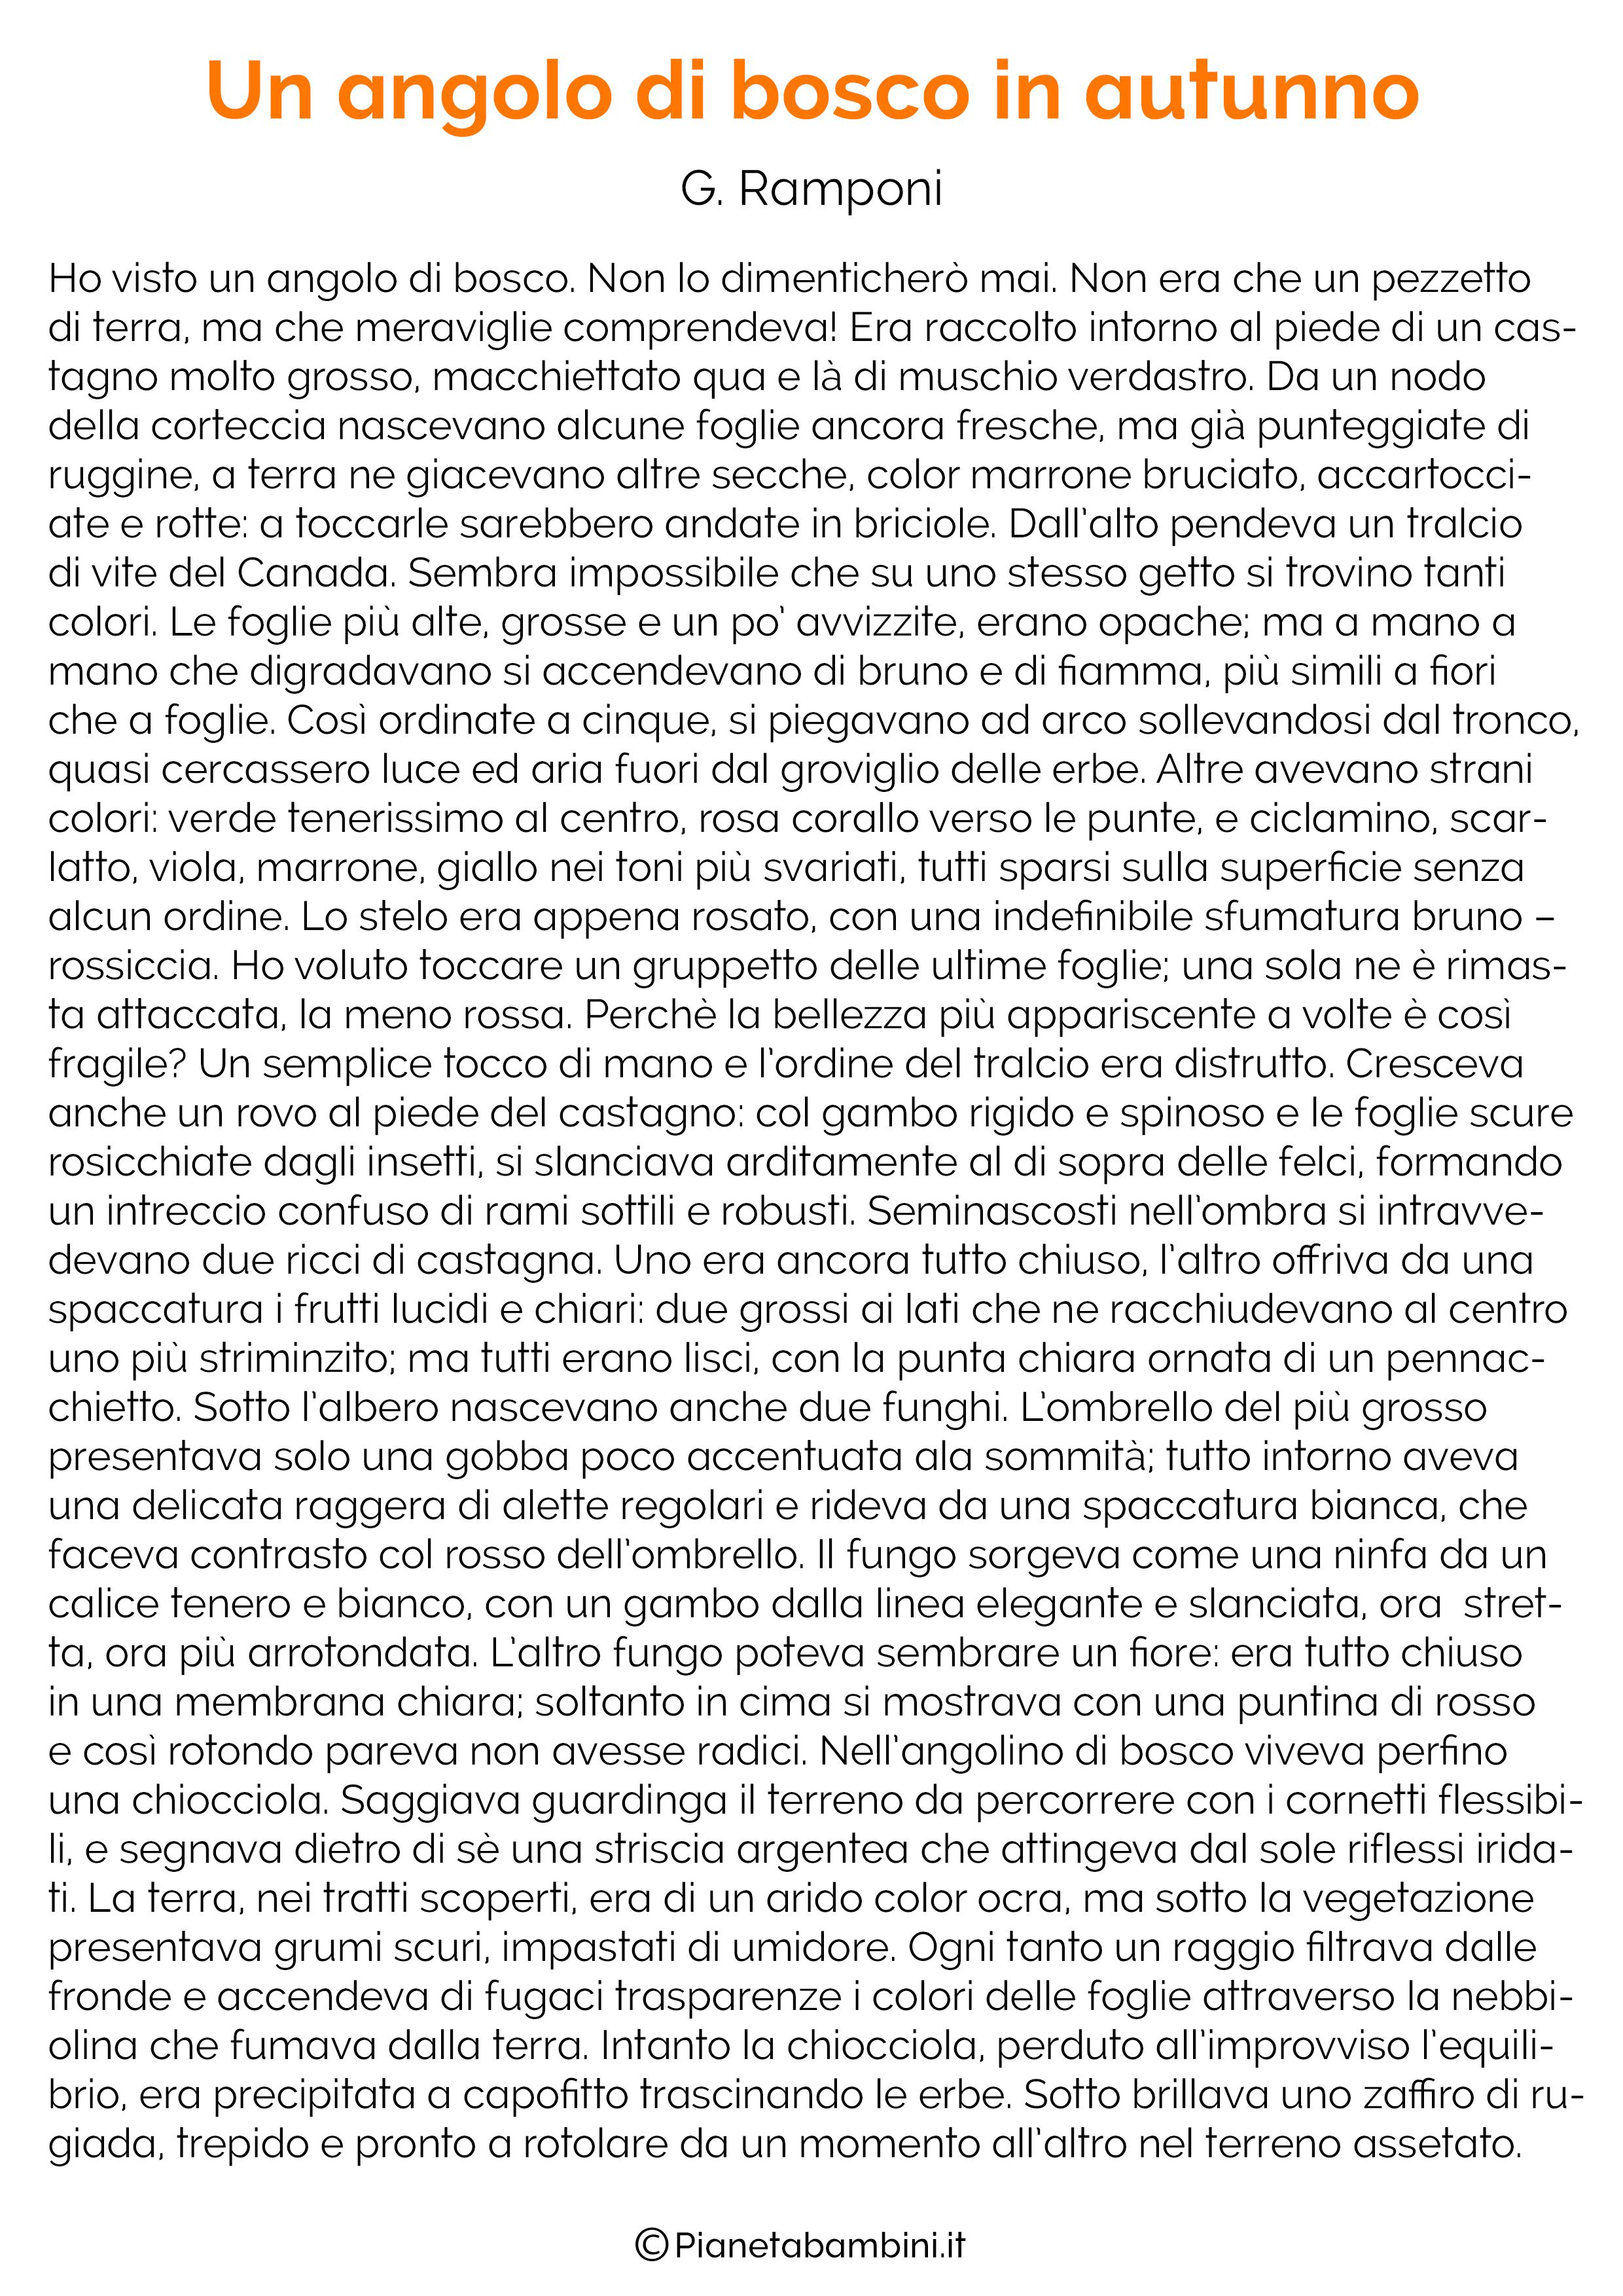 Racconto sull'autunno n.12